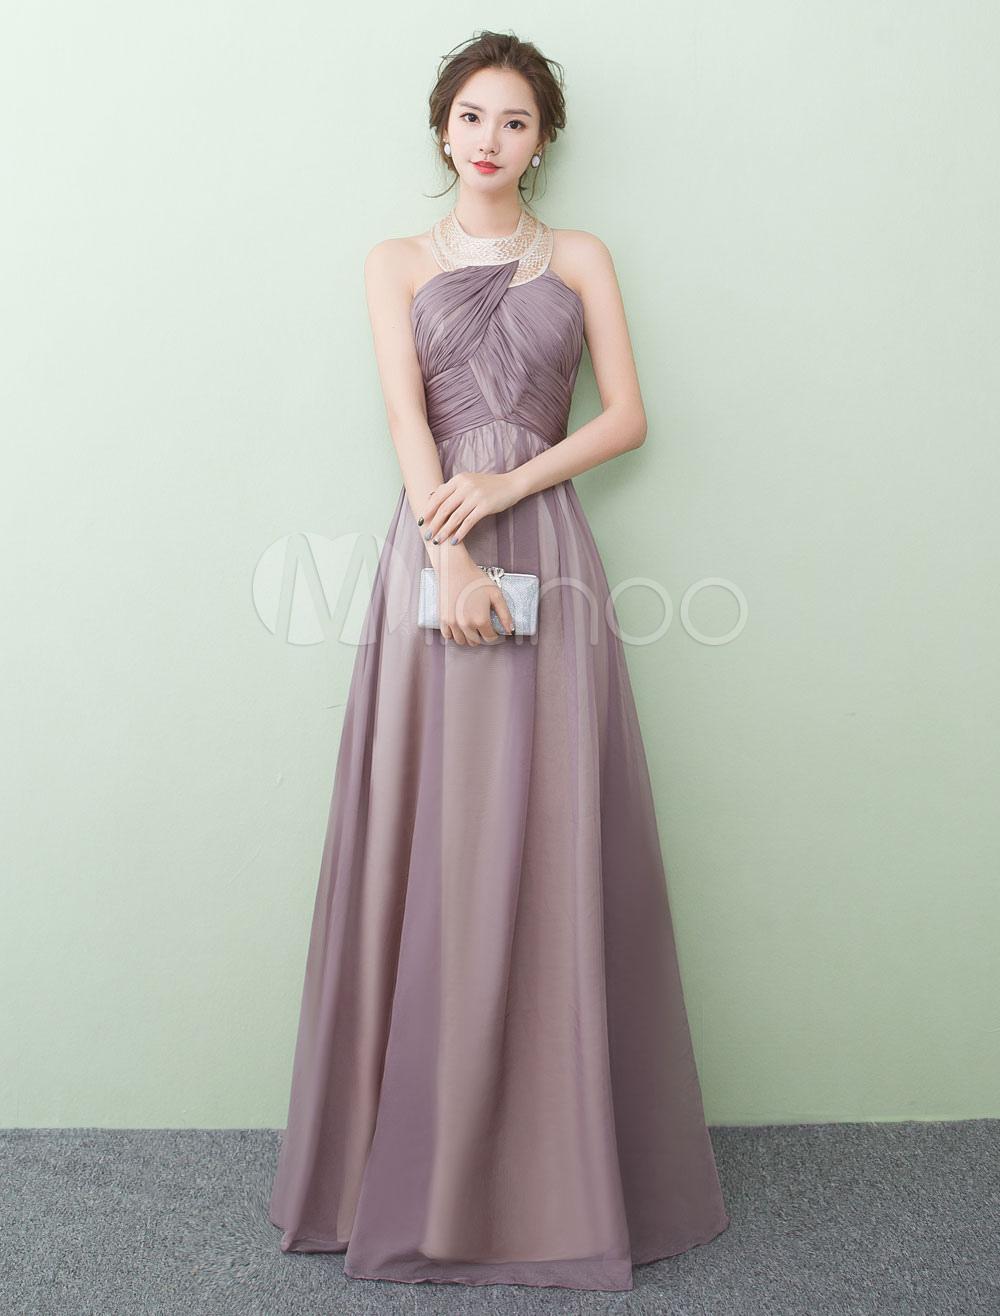 Chiffon Prom Dresses Halter Floor Length Evening Dresses Cameo Pink Sleeveless Pleated A Line Party Dress (Wedding) photo